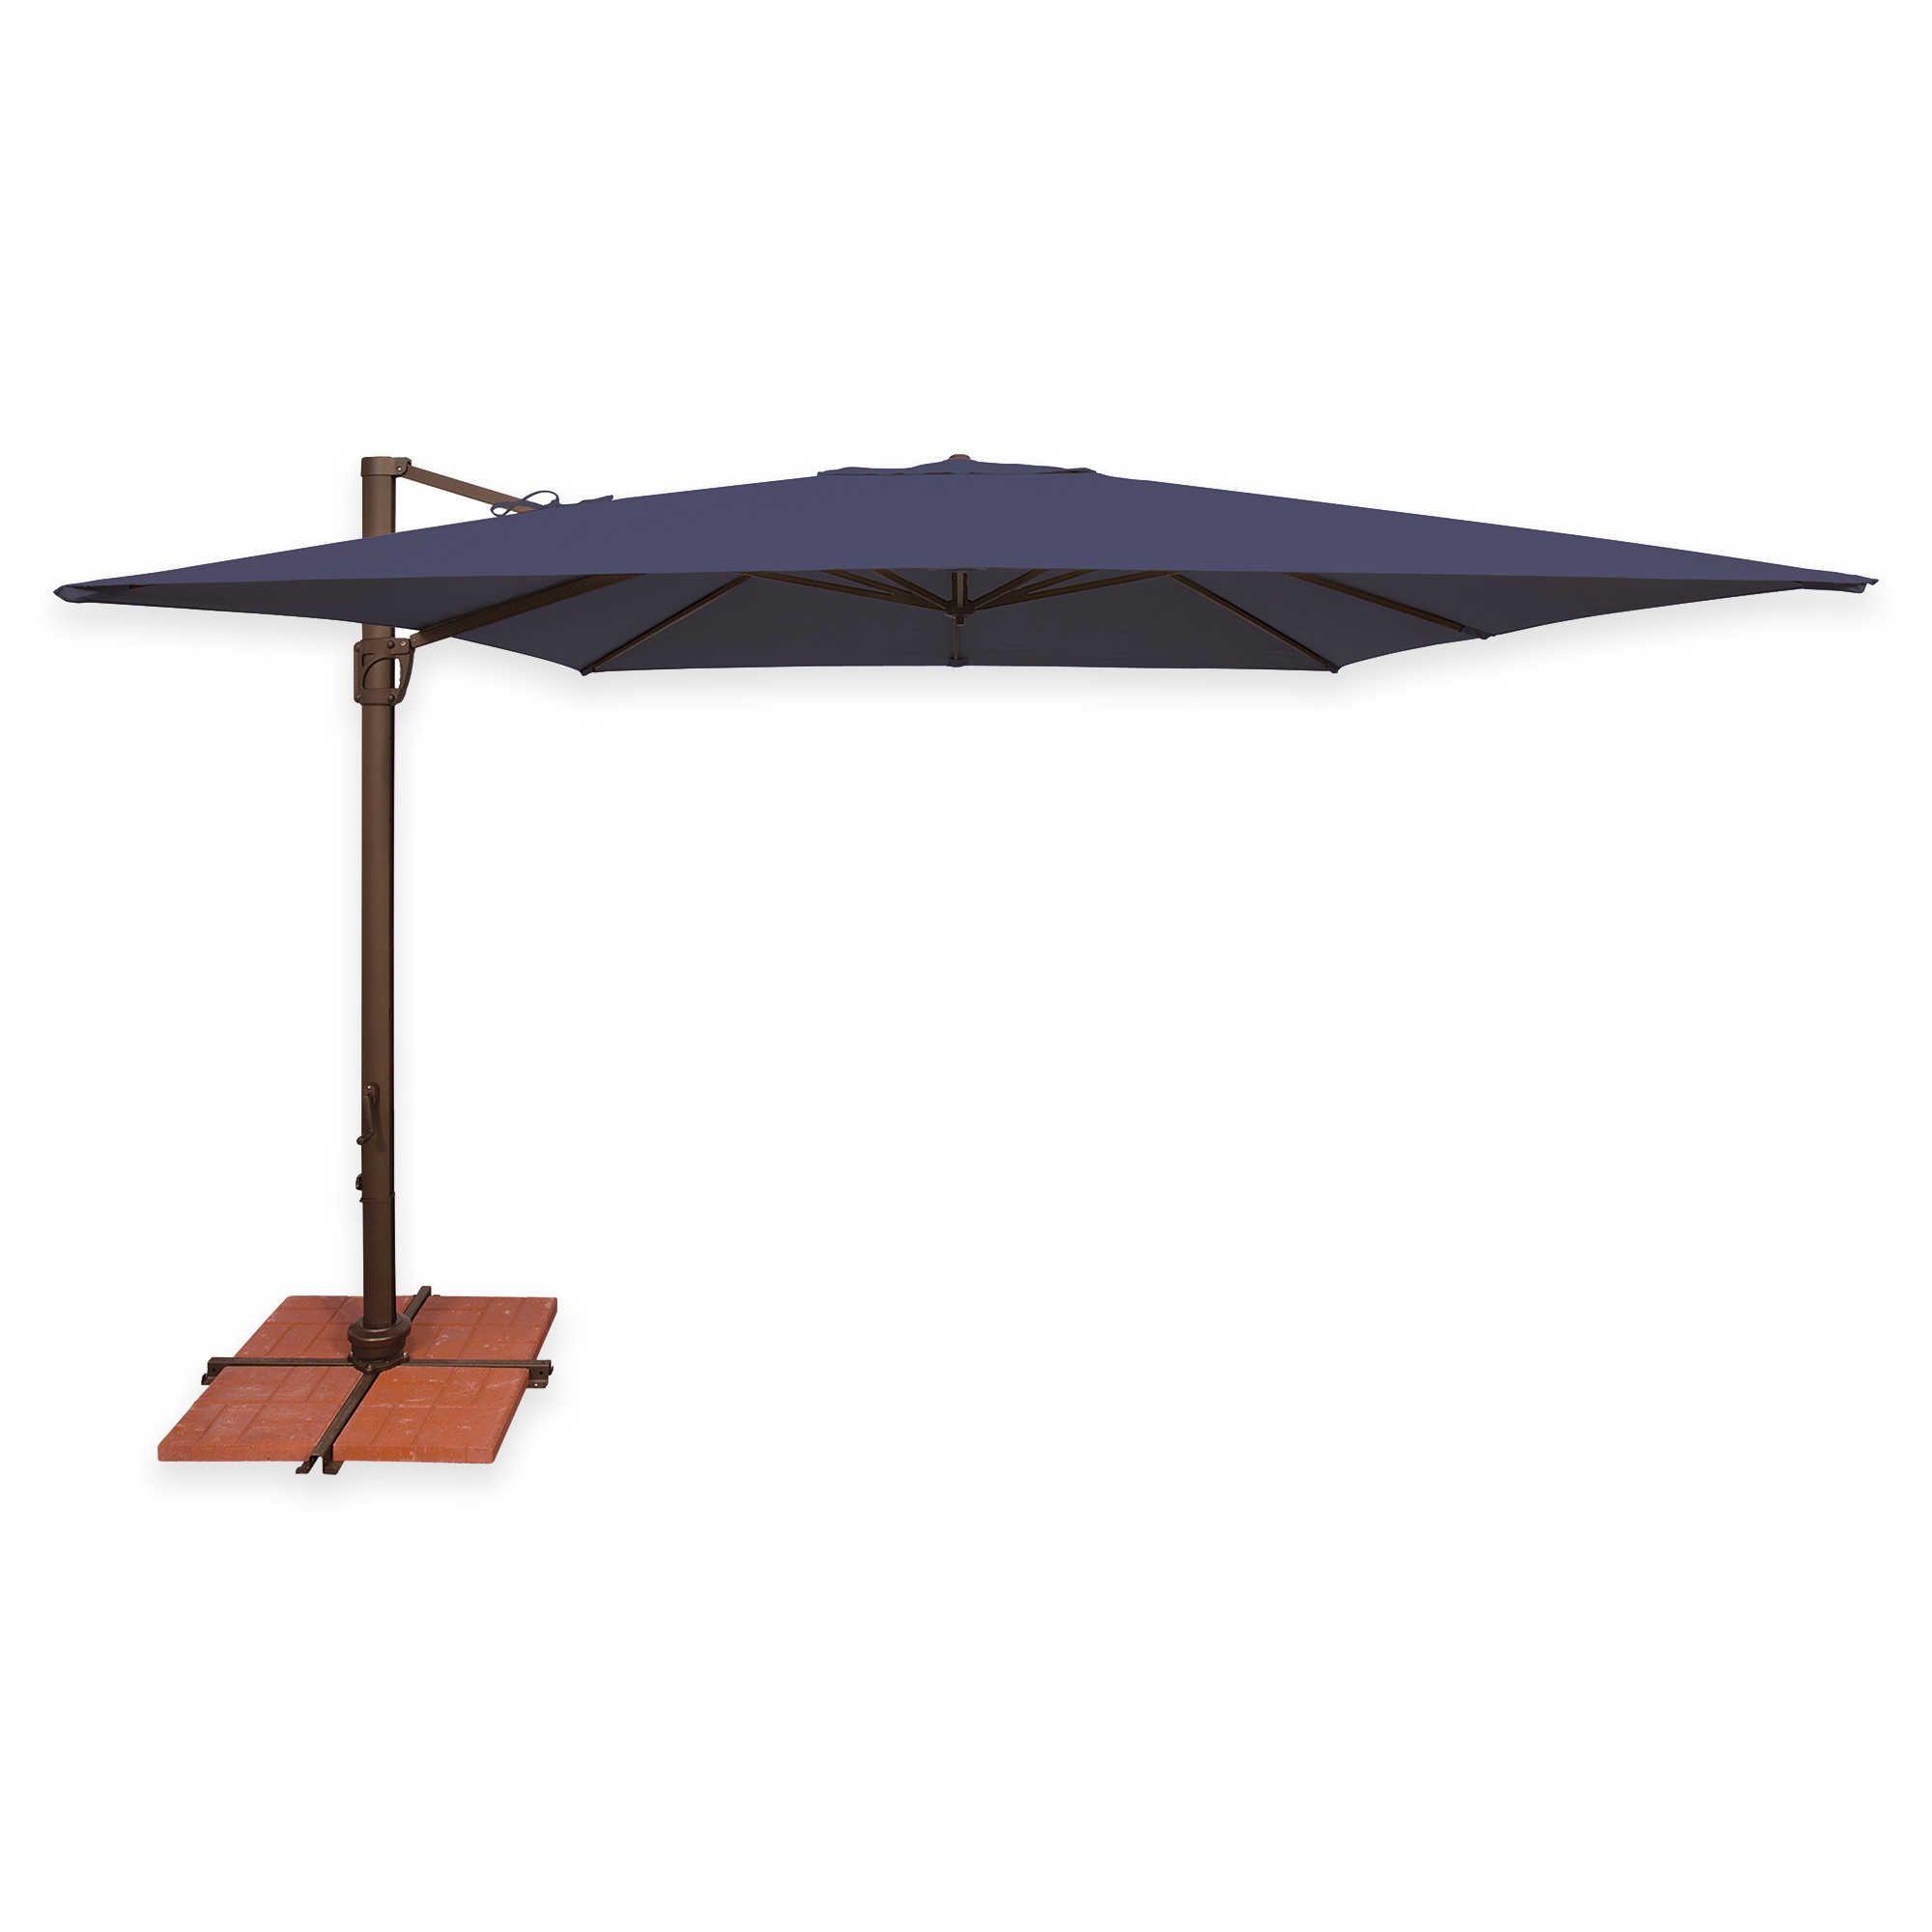 SimplyShade Bali 10Foot Square Cantilever Umbrella in